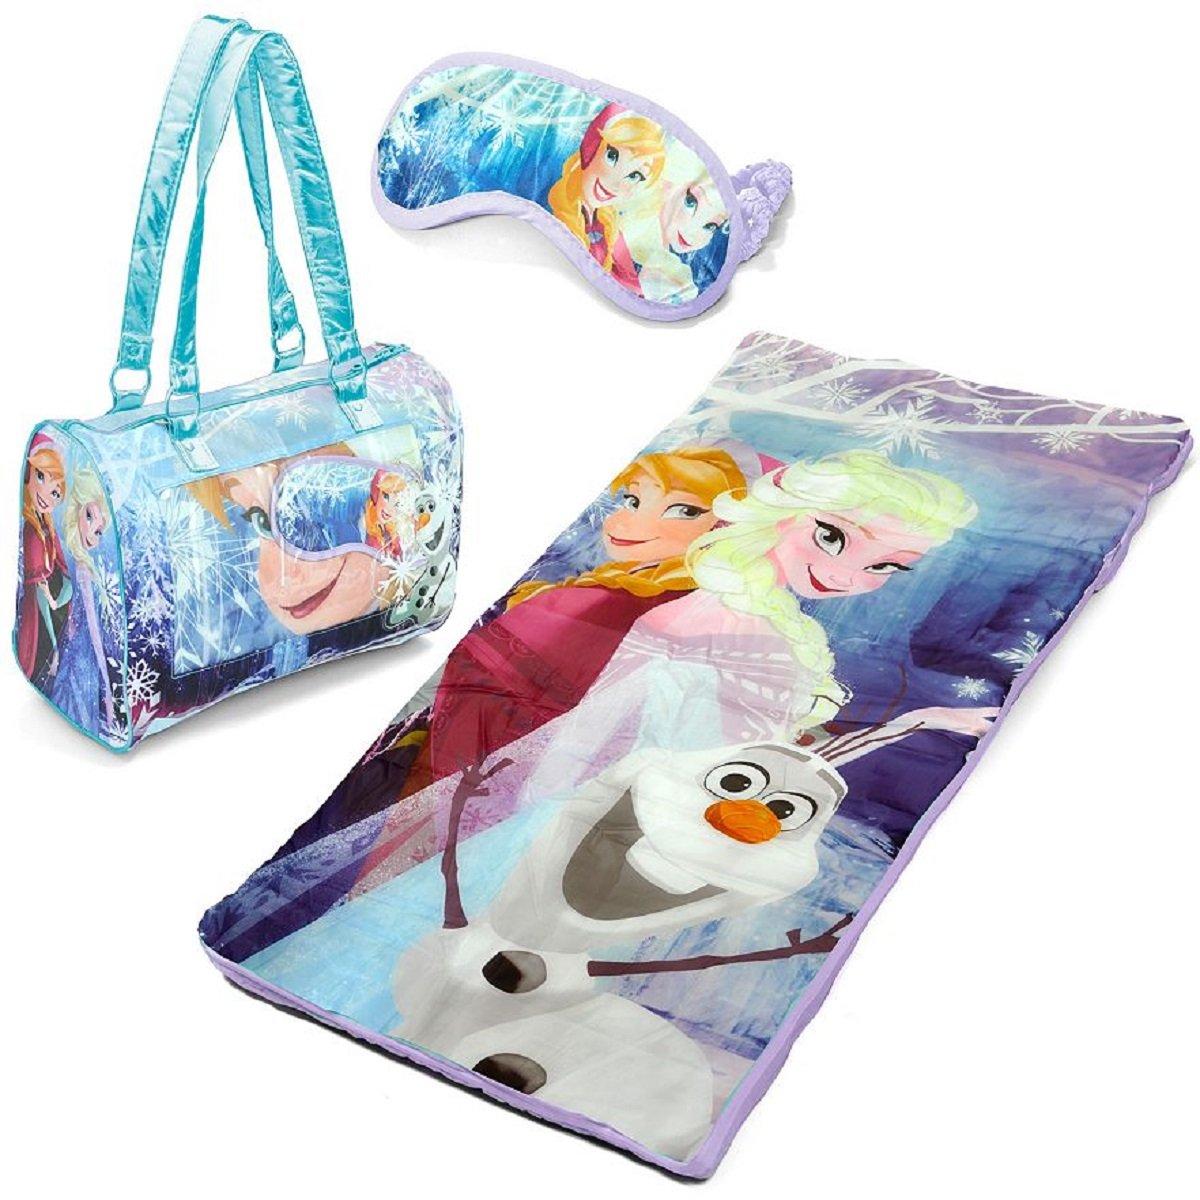 Frozen Sleeping Bags  Sleepover Sets  WebNuggetzcom